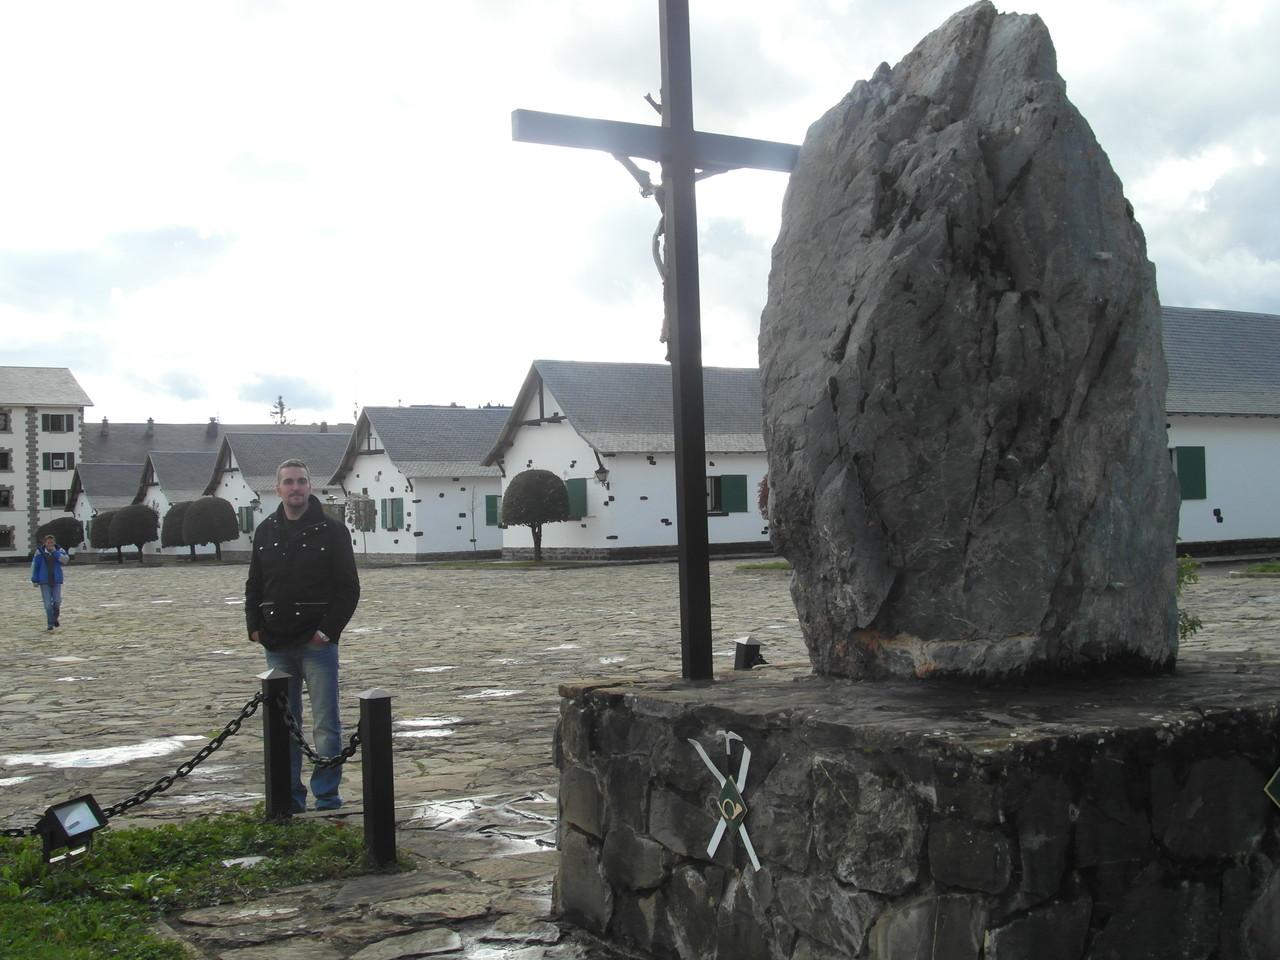 Monumeto patio de armas Jaca